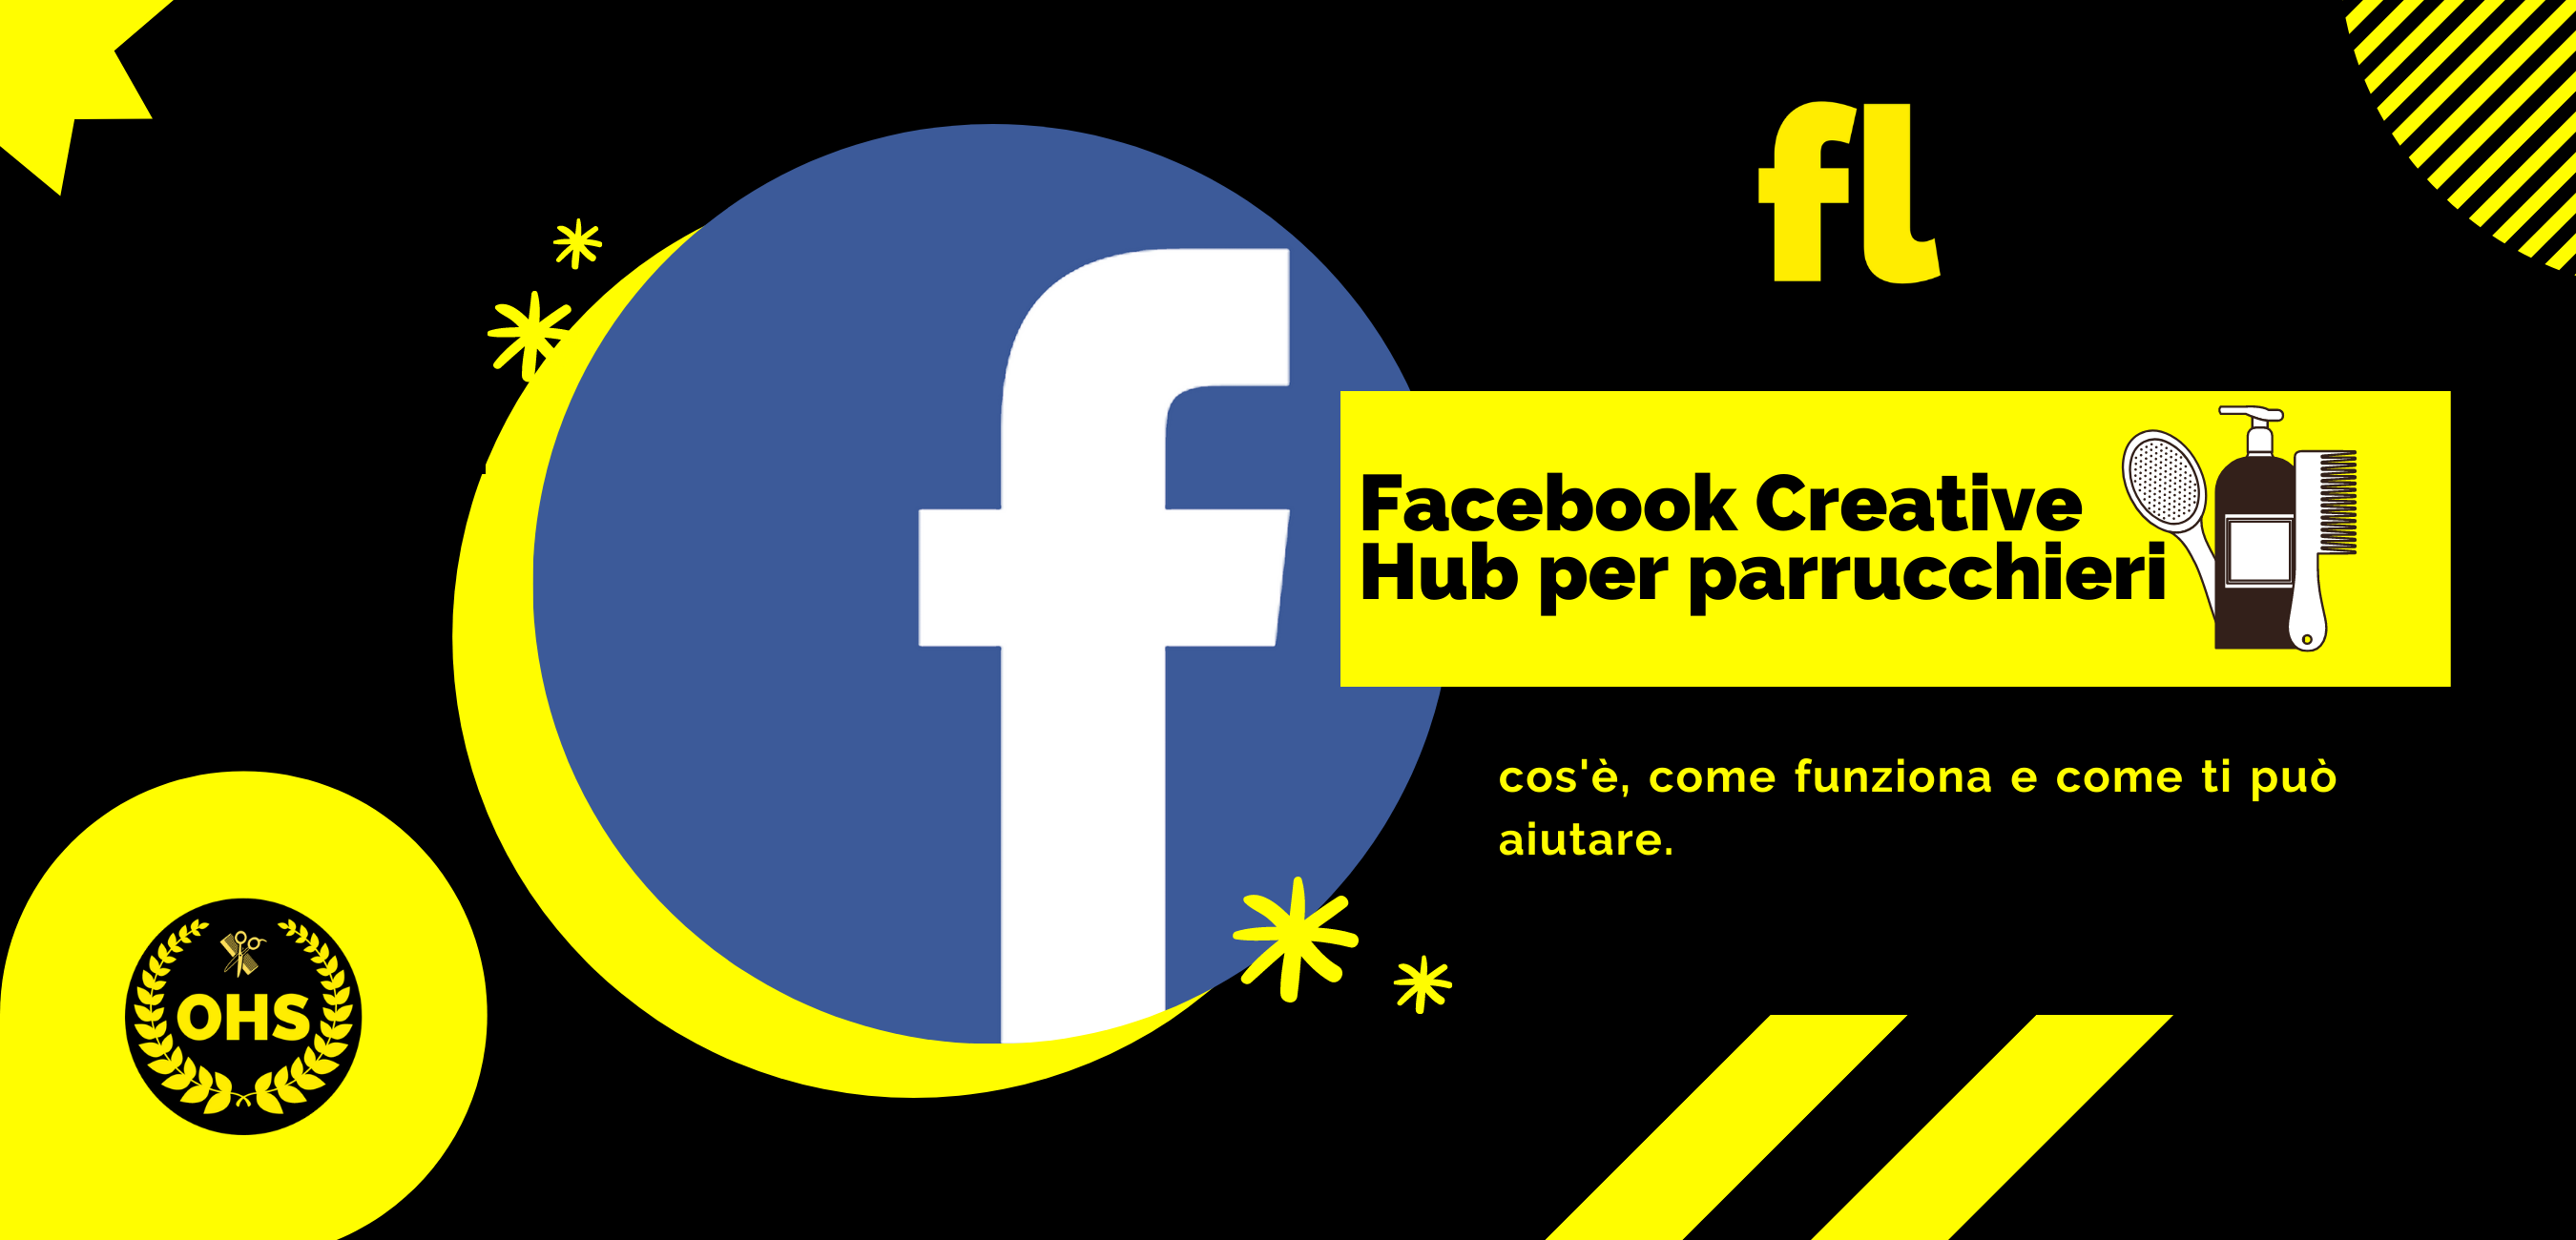 Facebook Creative Hub per parrucchieri